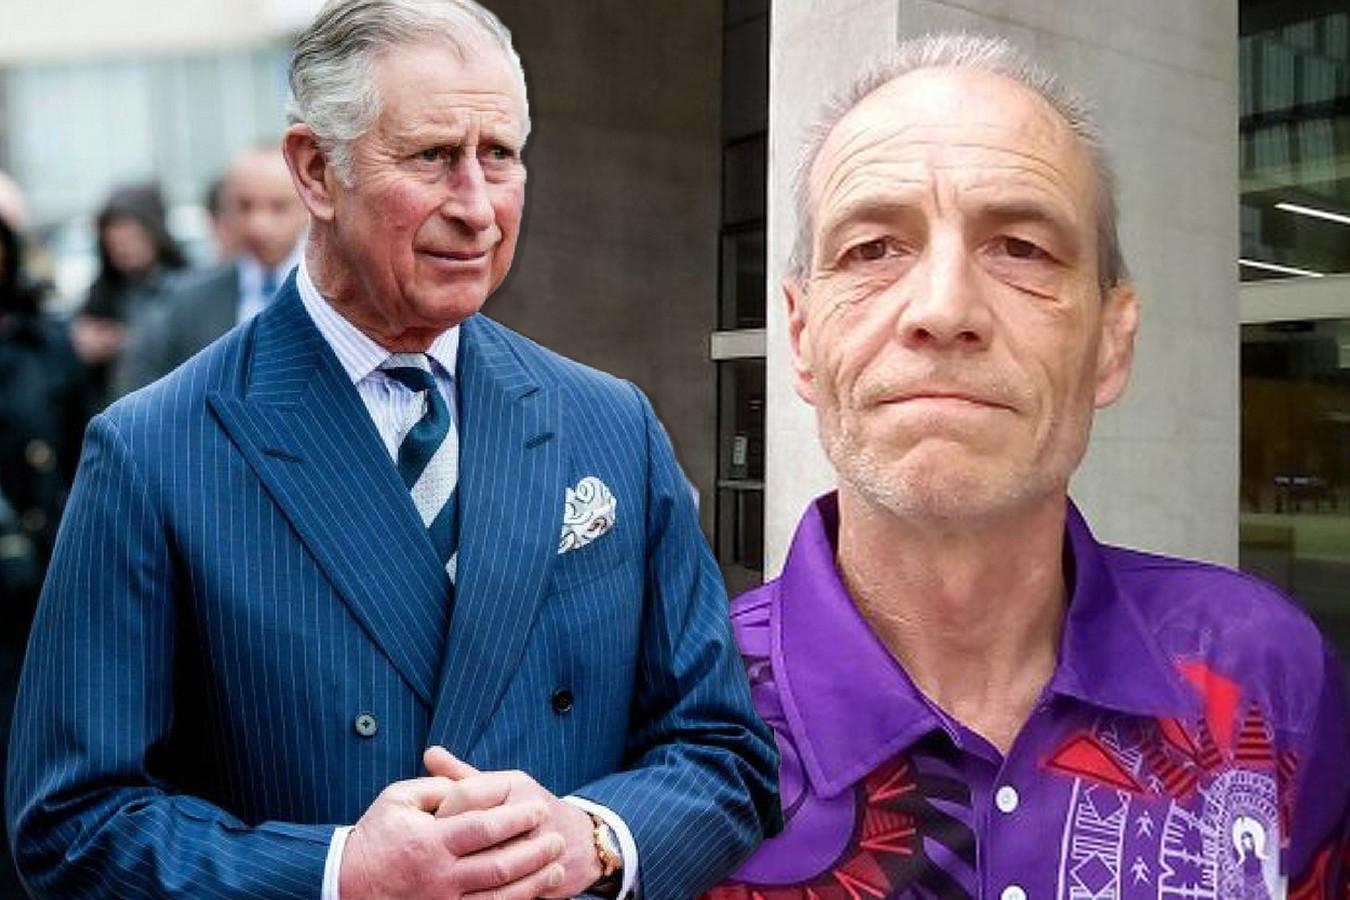 Simon Dorante-Day en zijn vermeende vader prins Charles